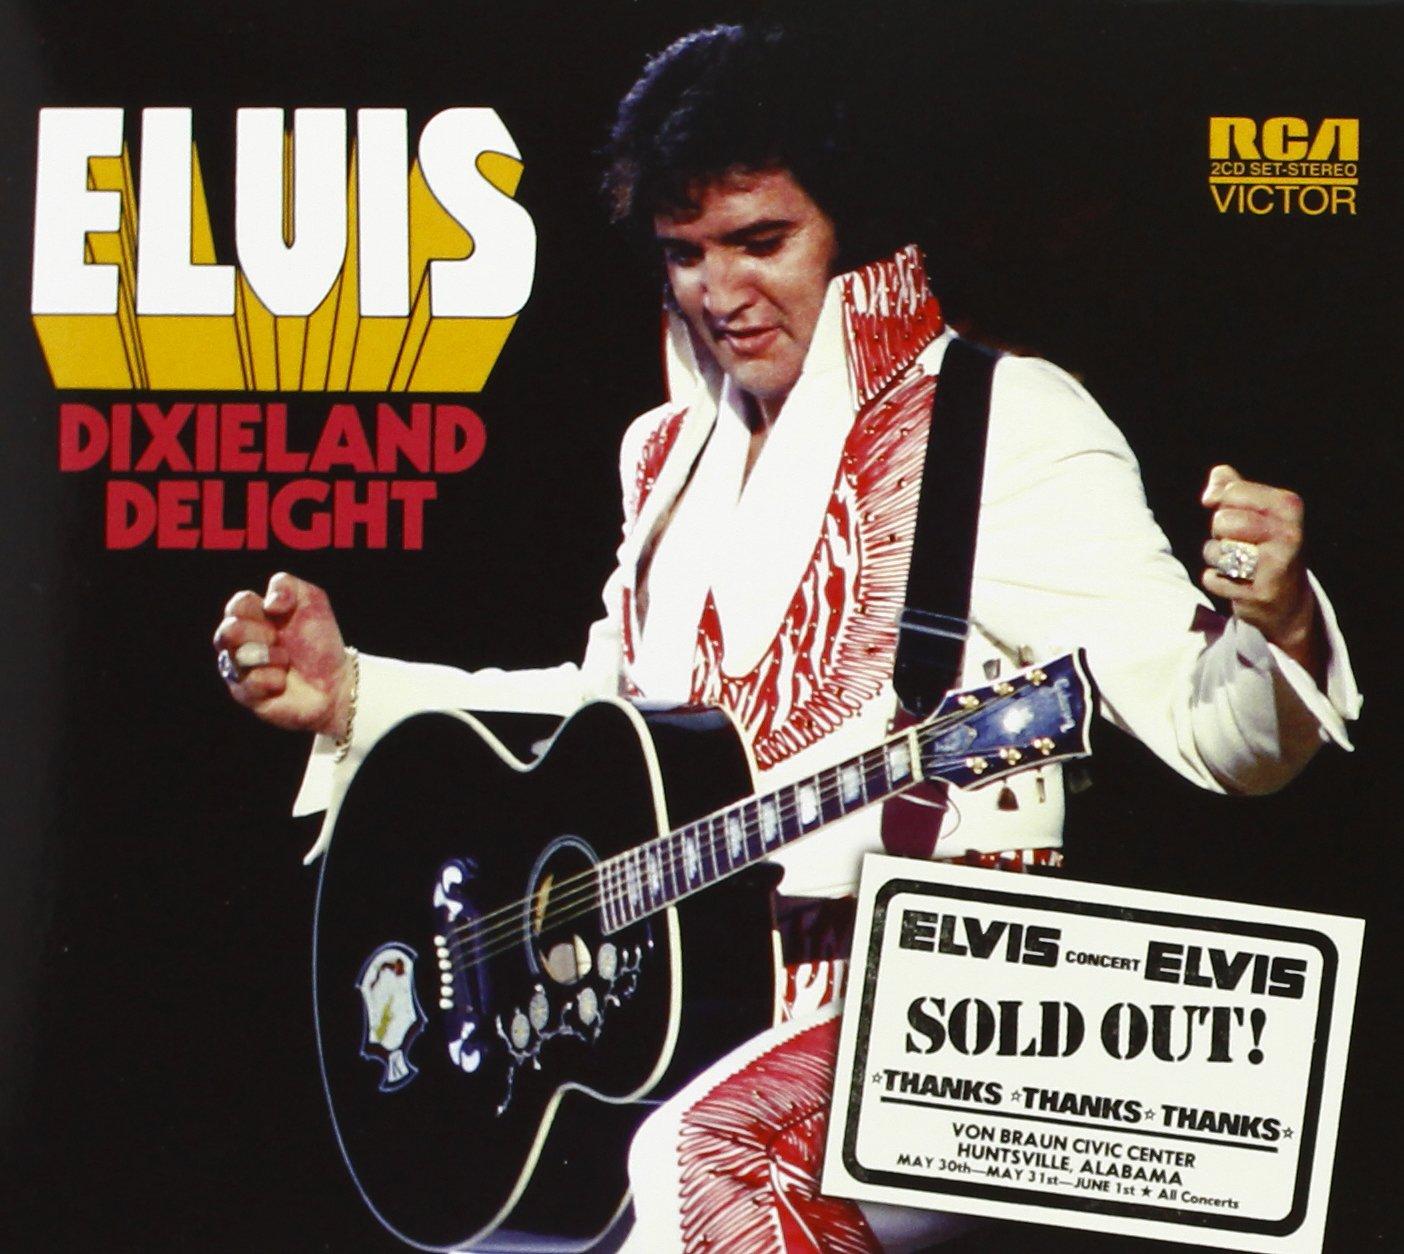 Elvis: Dixieland Delight, 1975 by Presley, Elvis